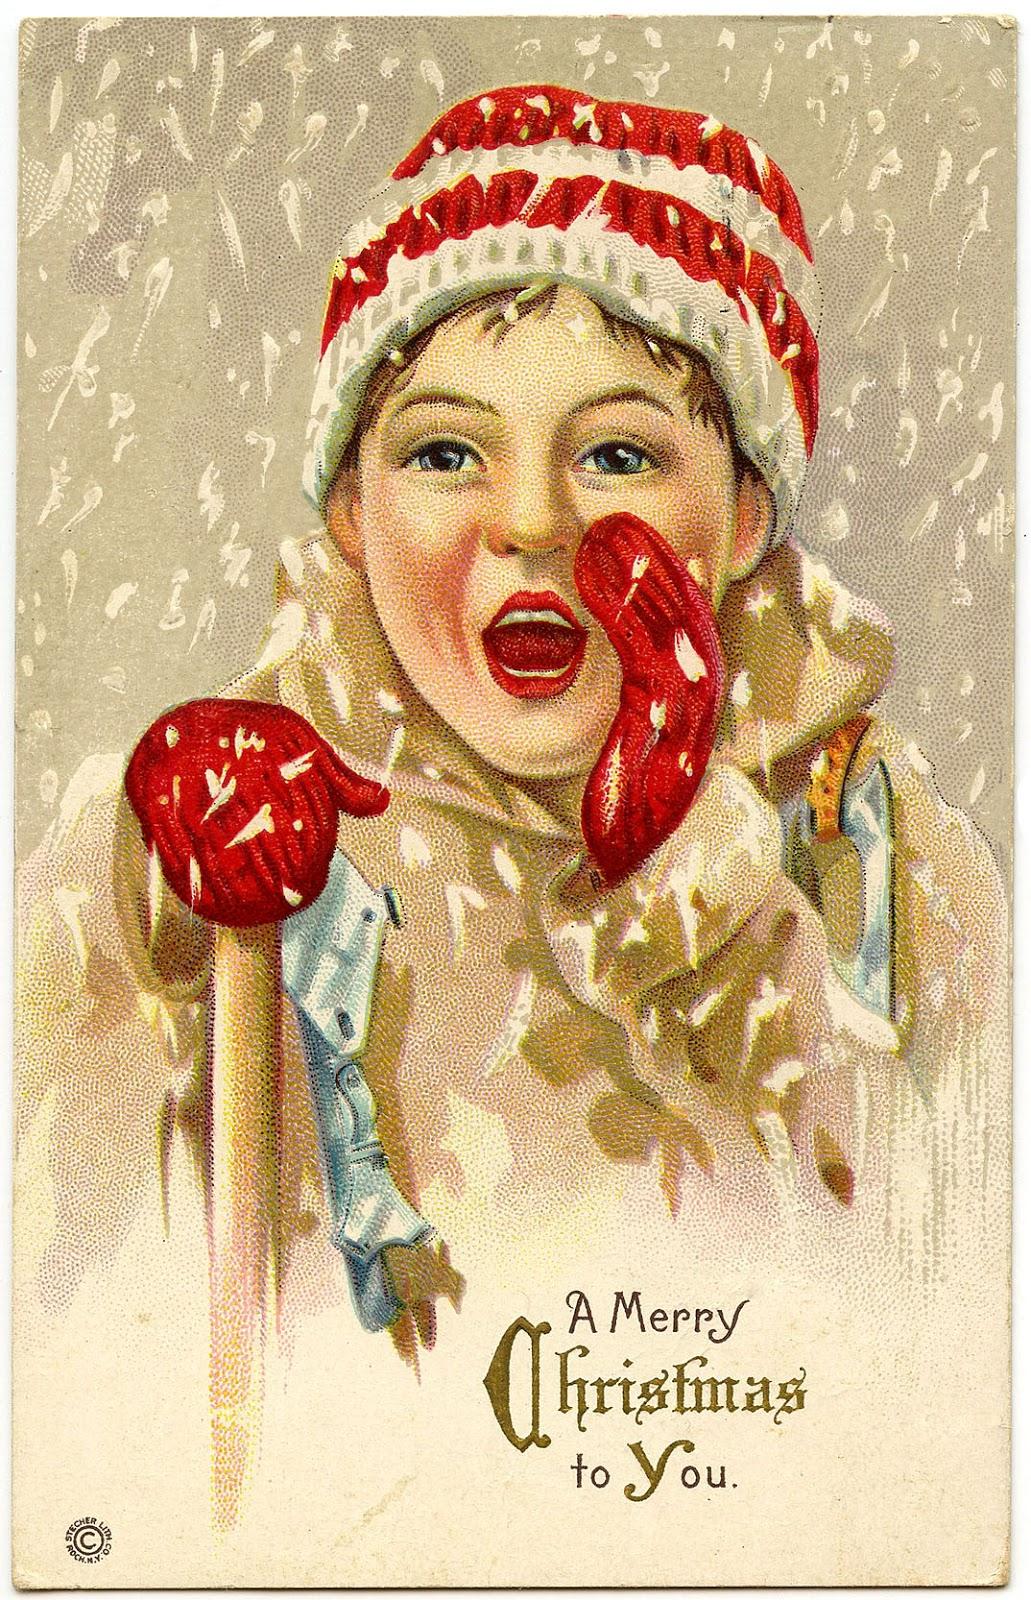 ChristmasSnowBoyVintage GraphicsFairy1 ChristmasMistletoe Vintage Christmas Clipart Graphicsfairy009b ChristmasCatVintageGraphicsFairy1